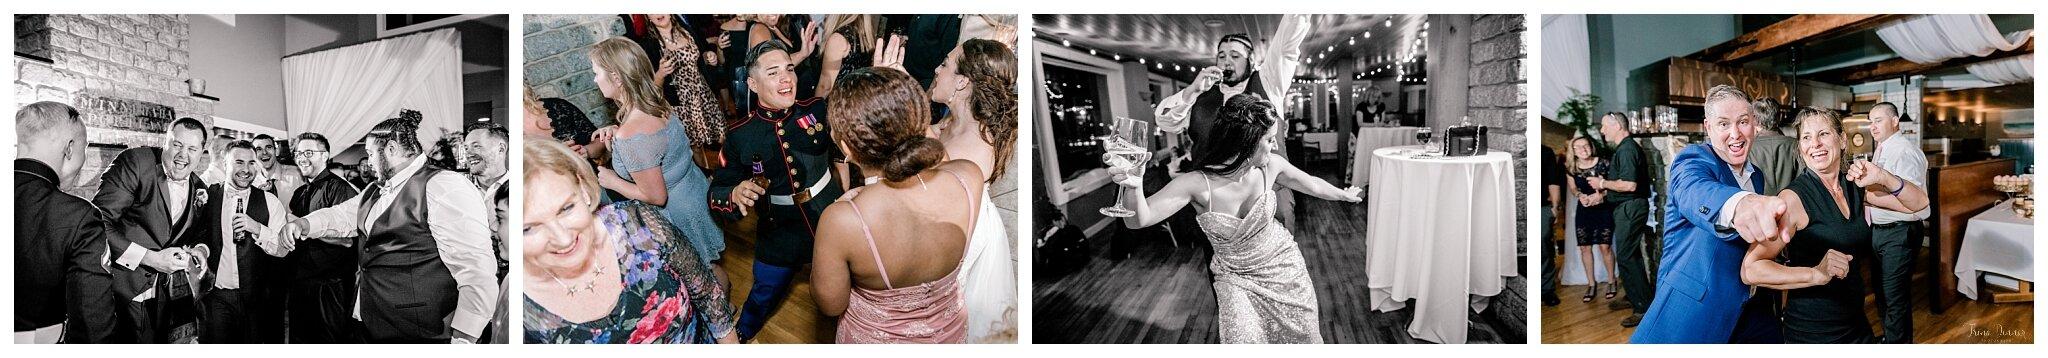 Saltwater Grille Wedding Reception Dancing